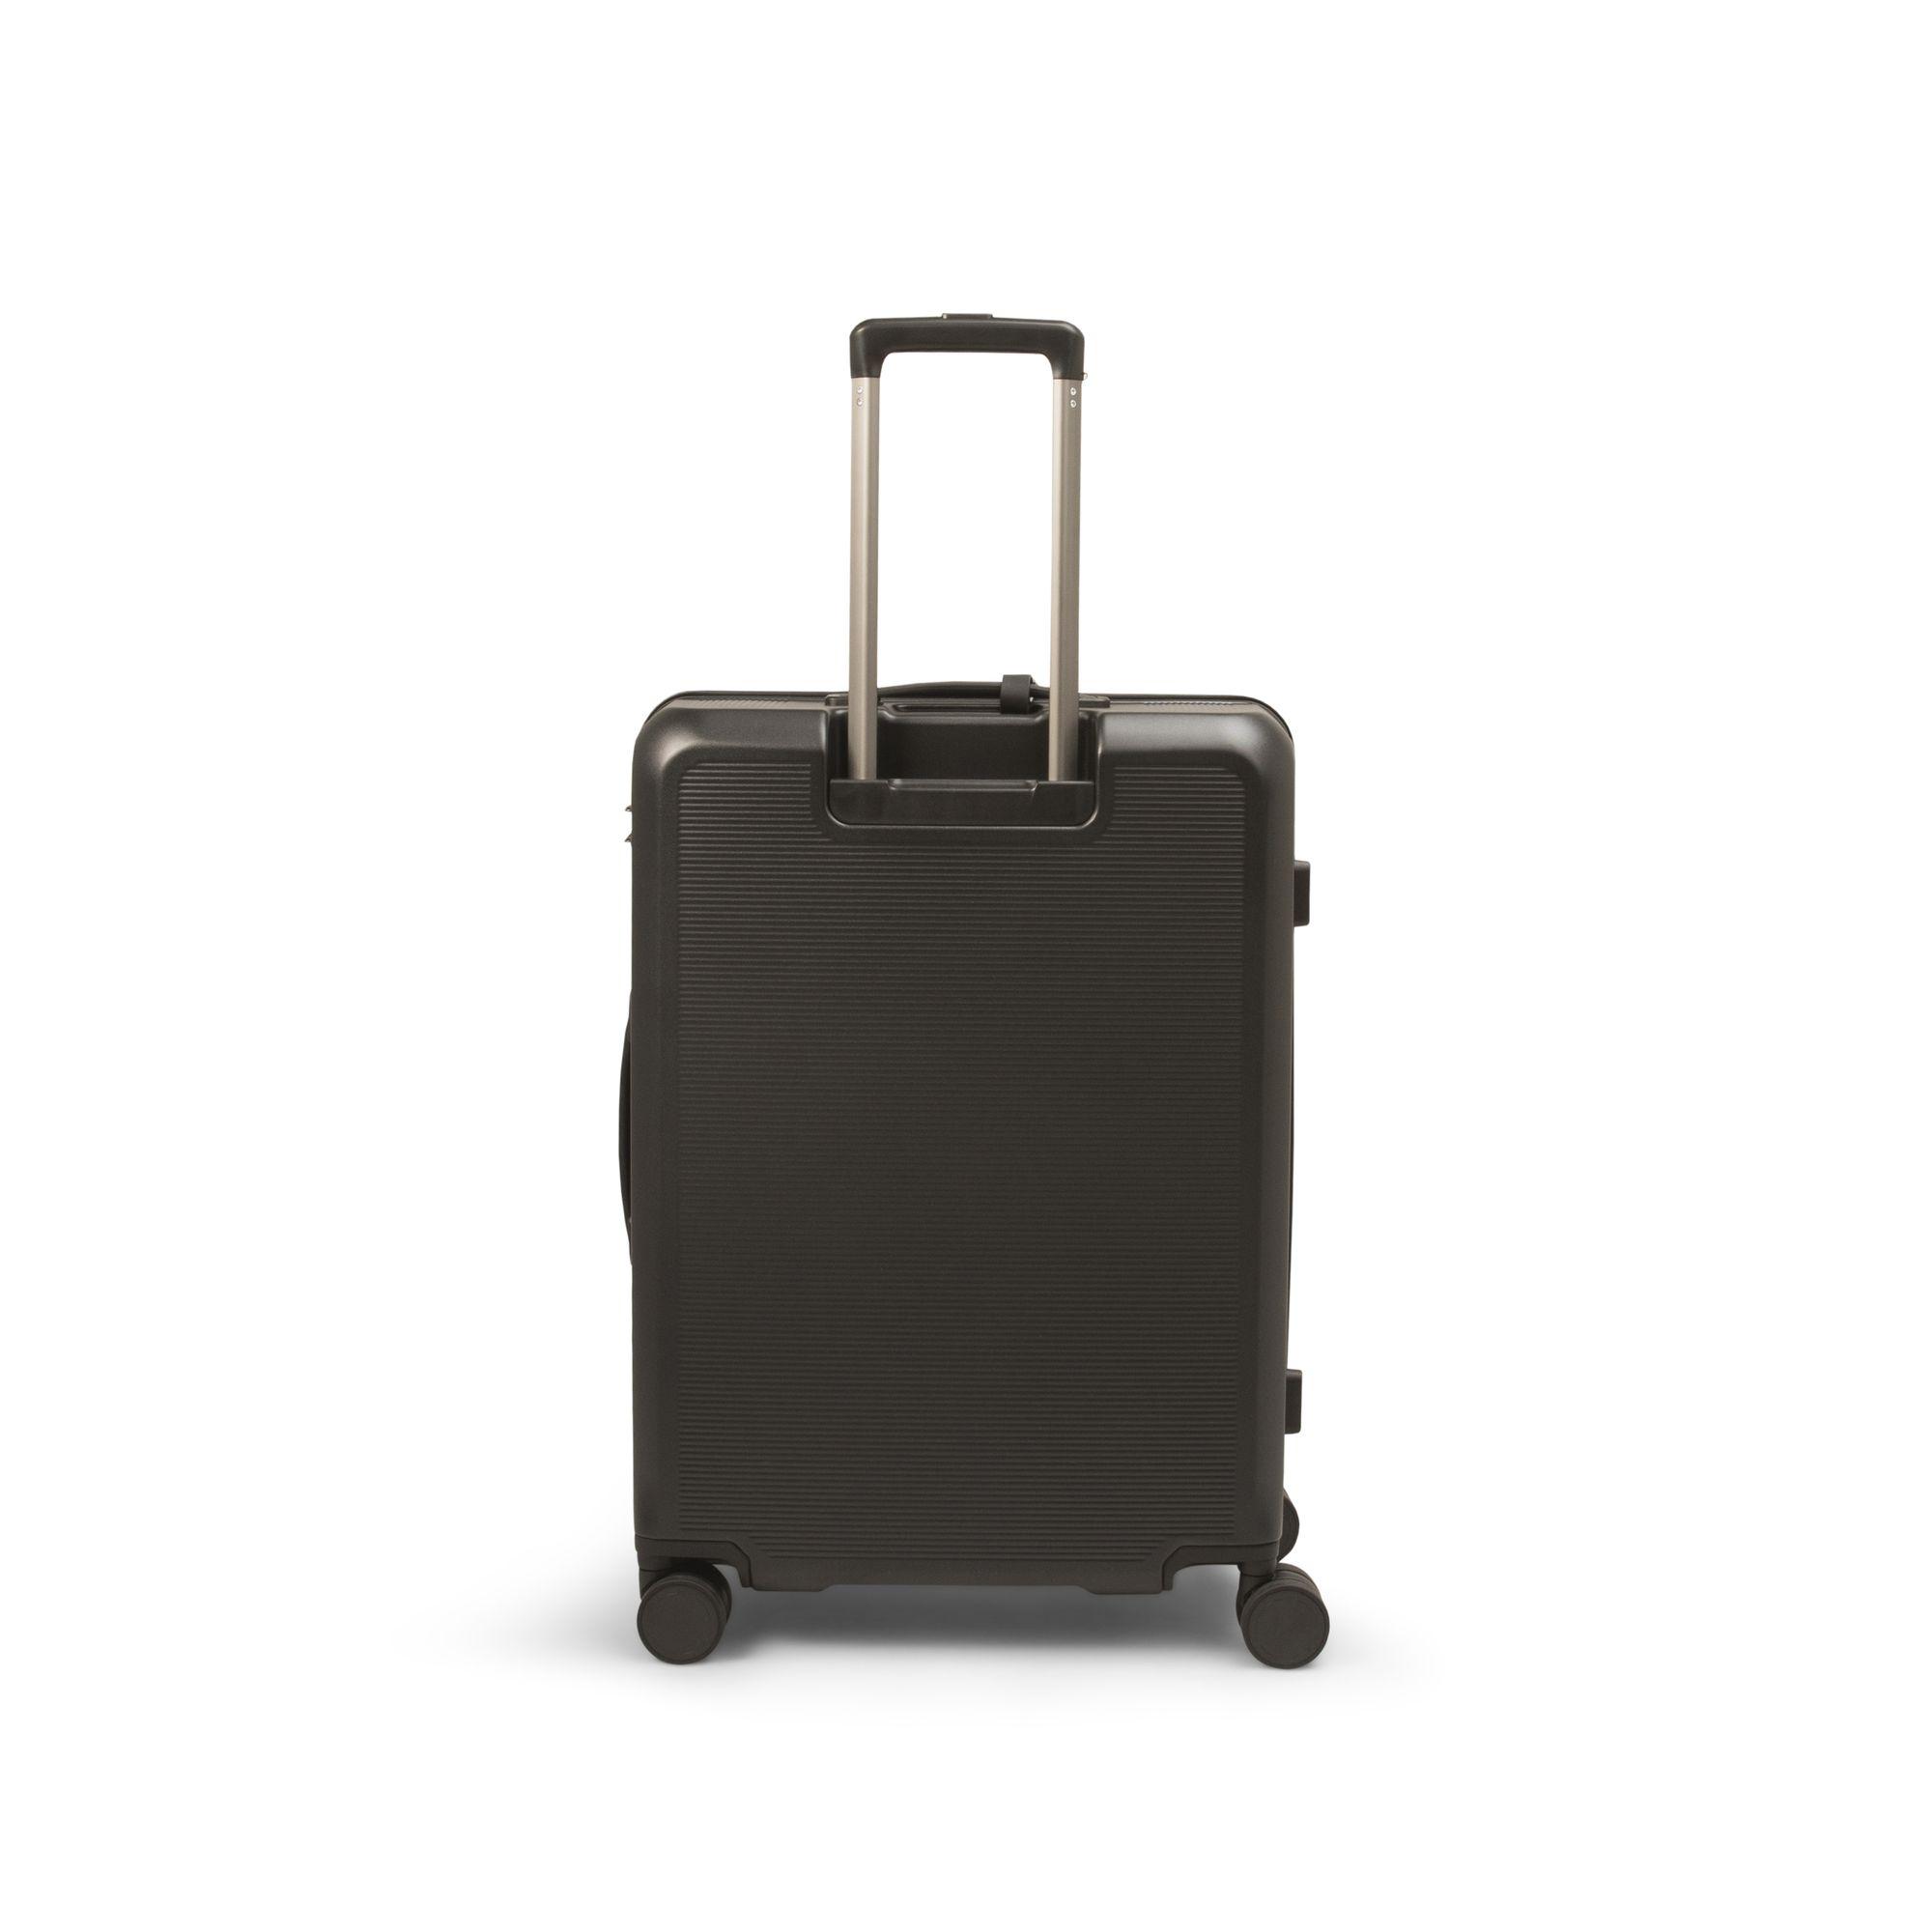 A TO B resväskor och reseaccessoarer | Shoppa på Accent.se